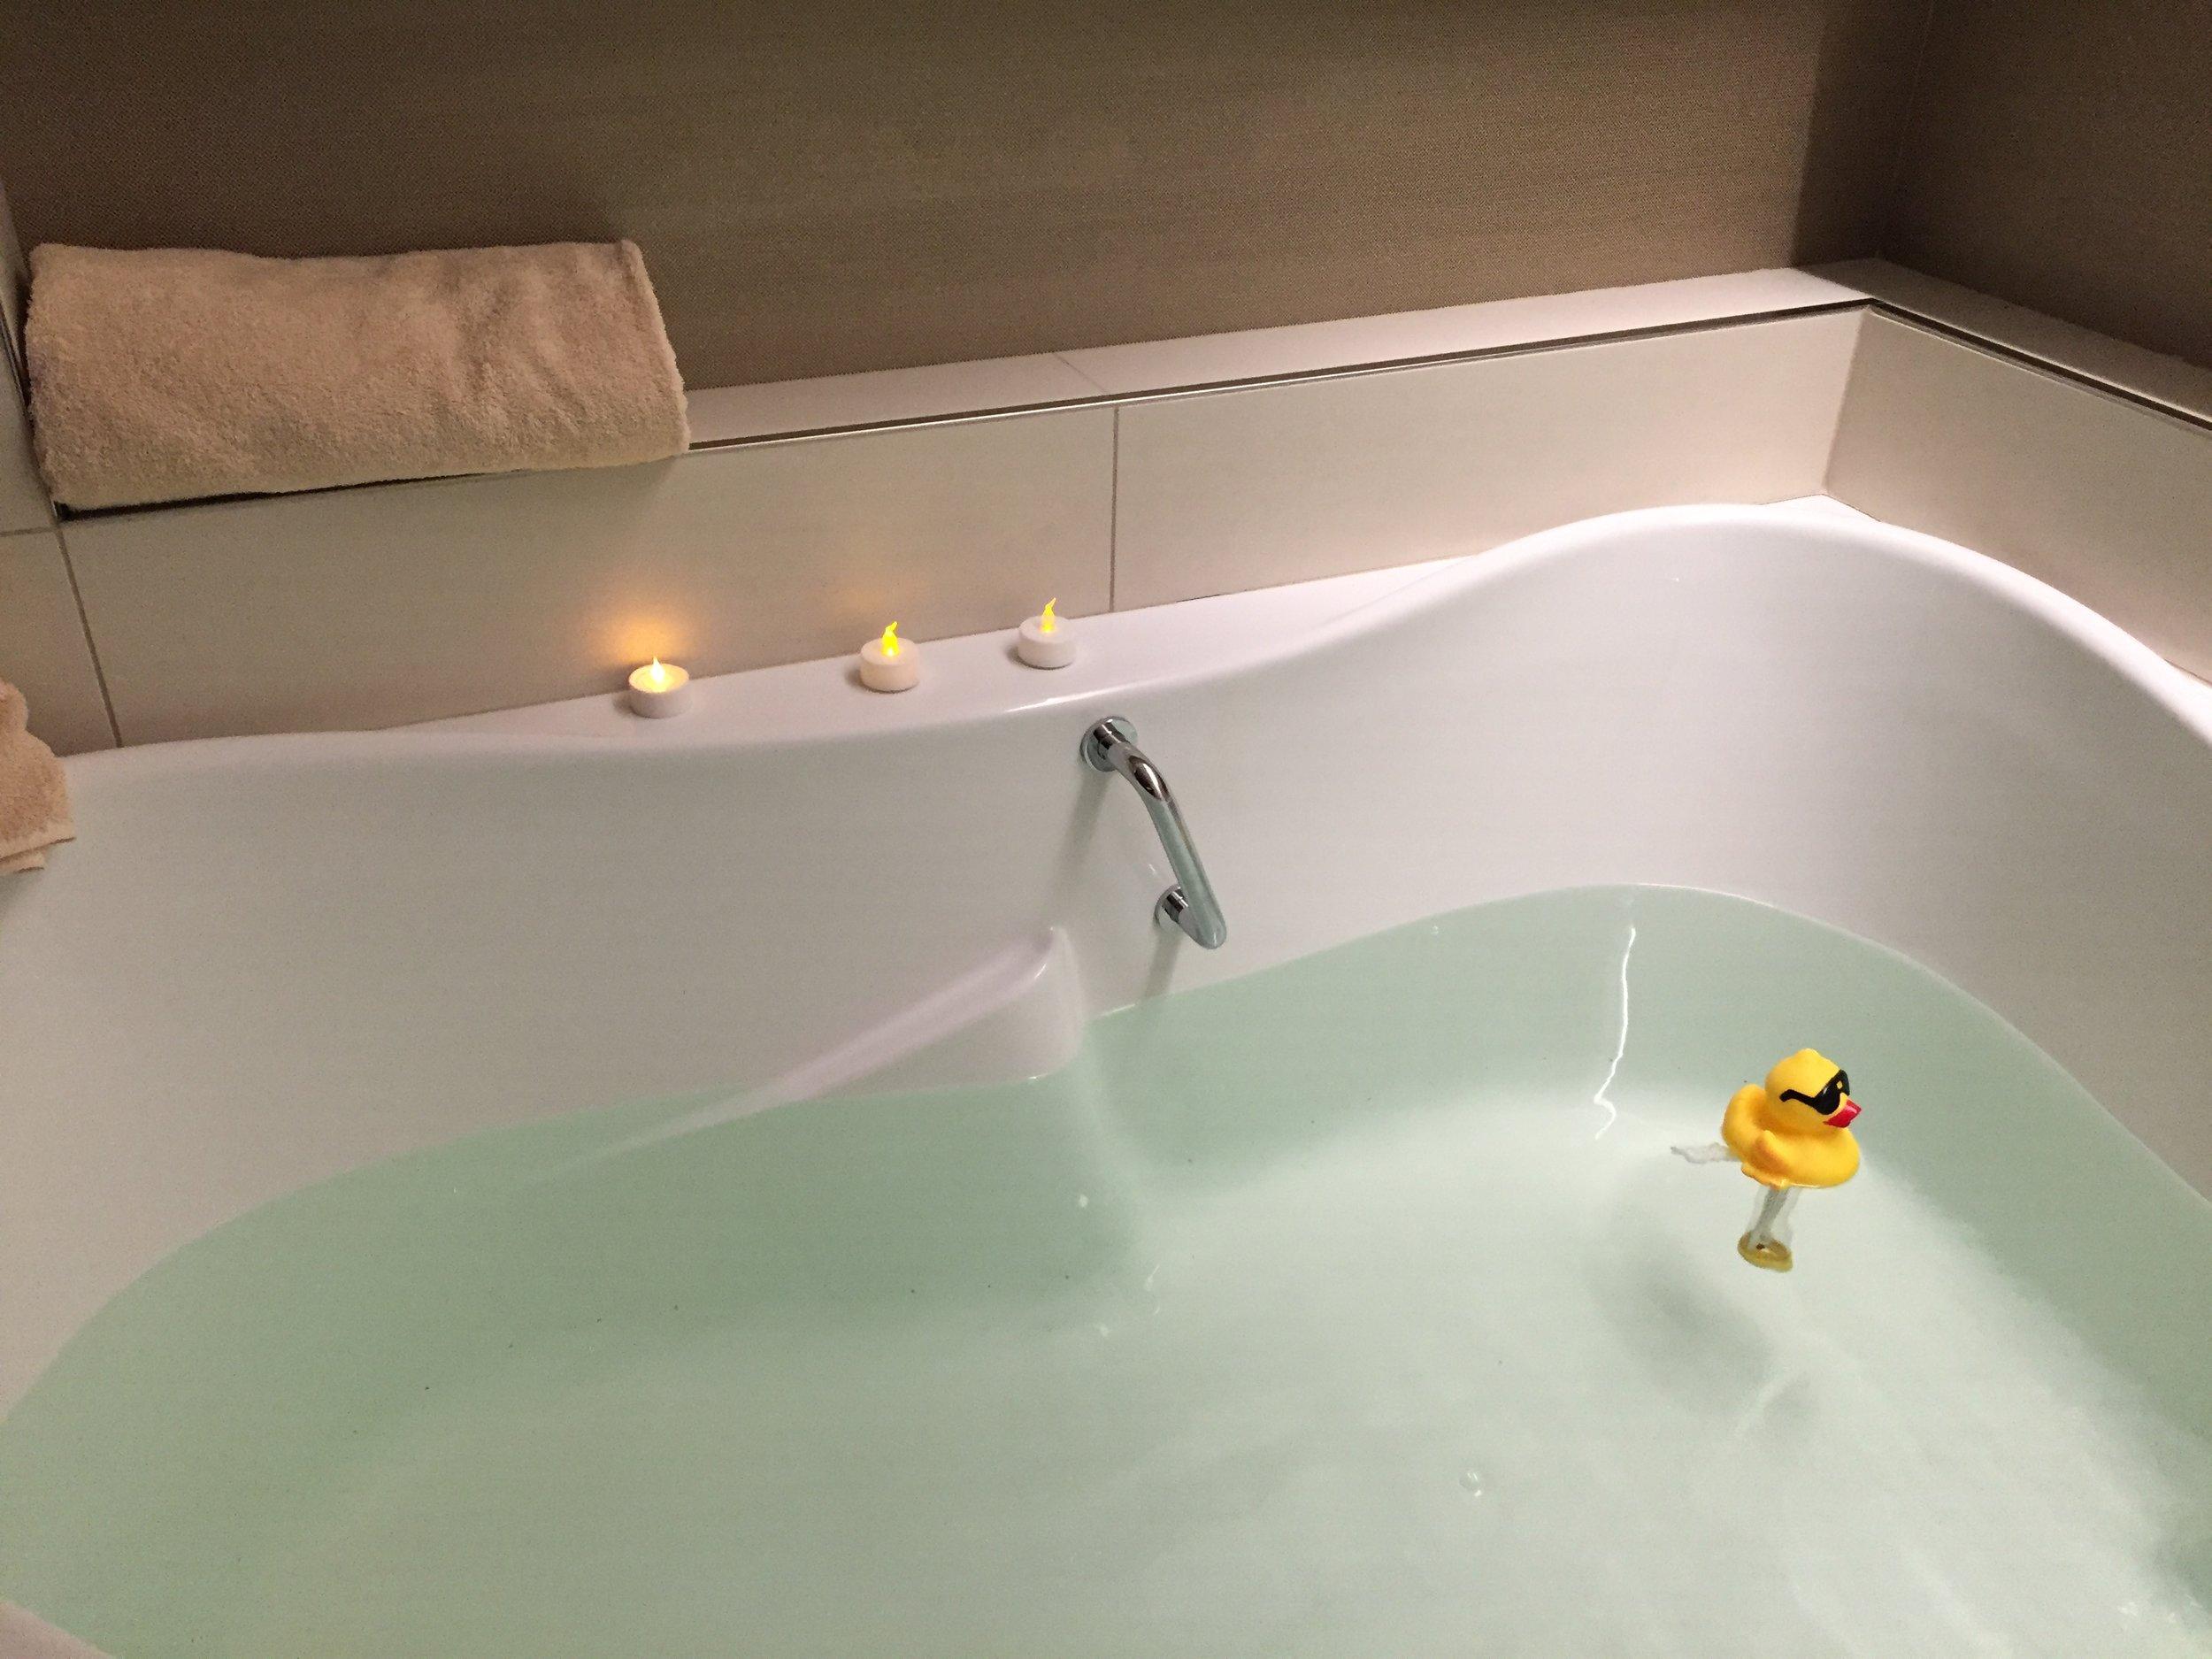 The Birthing Pool